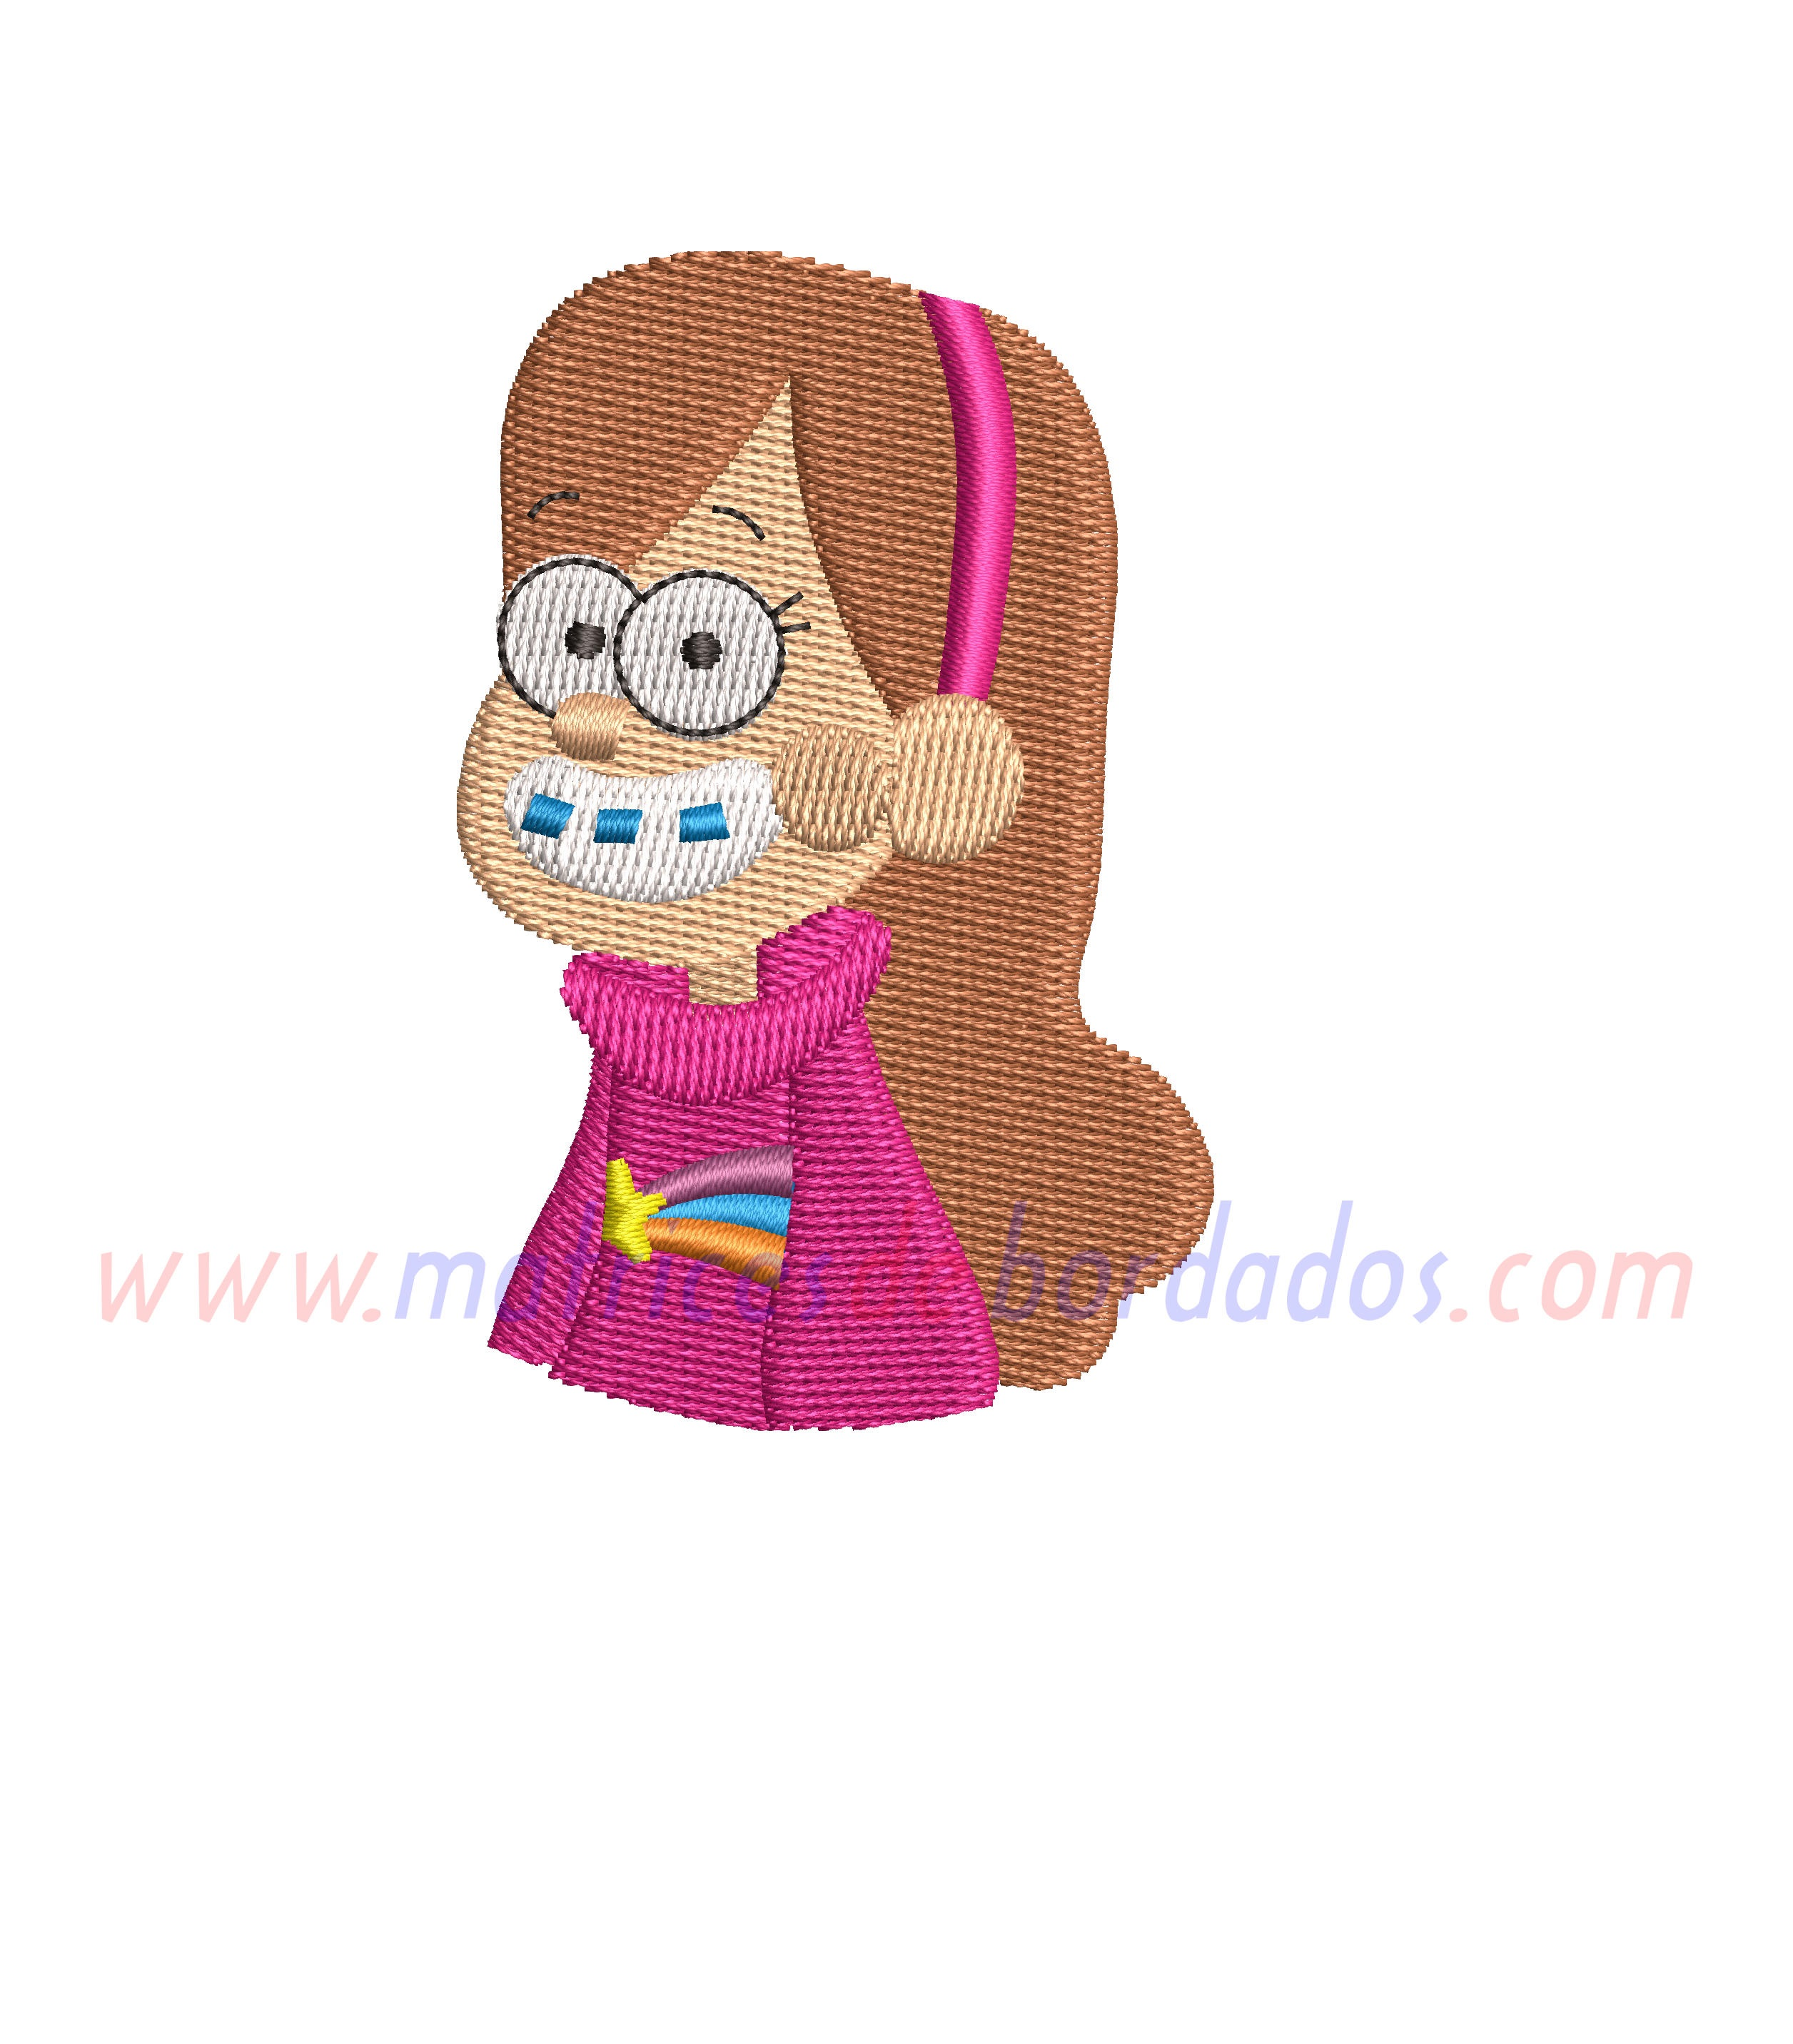 WQ64WU - Mabel Gravity Falls